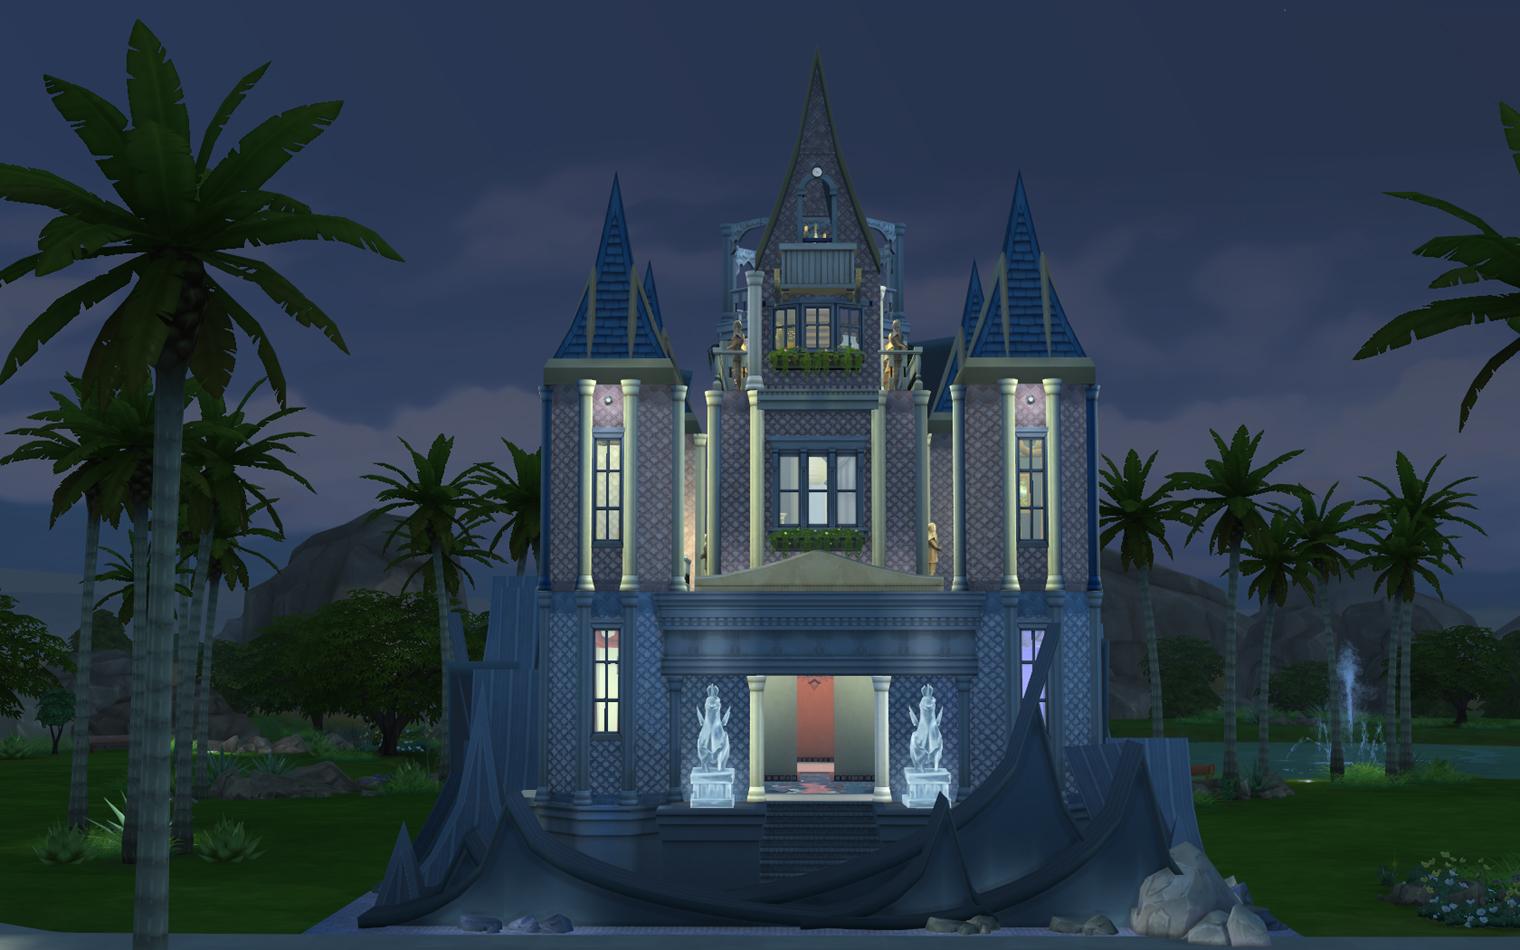 Mermaids Palace